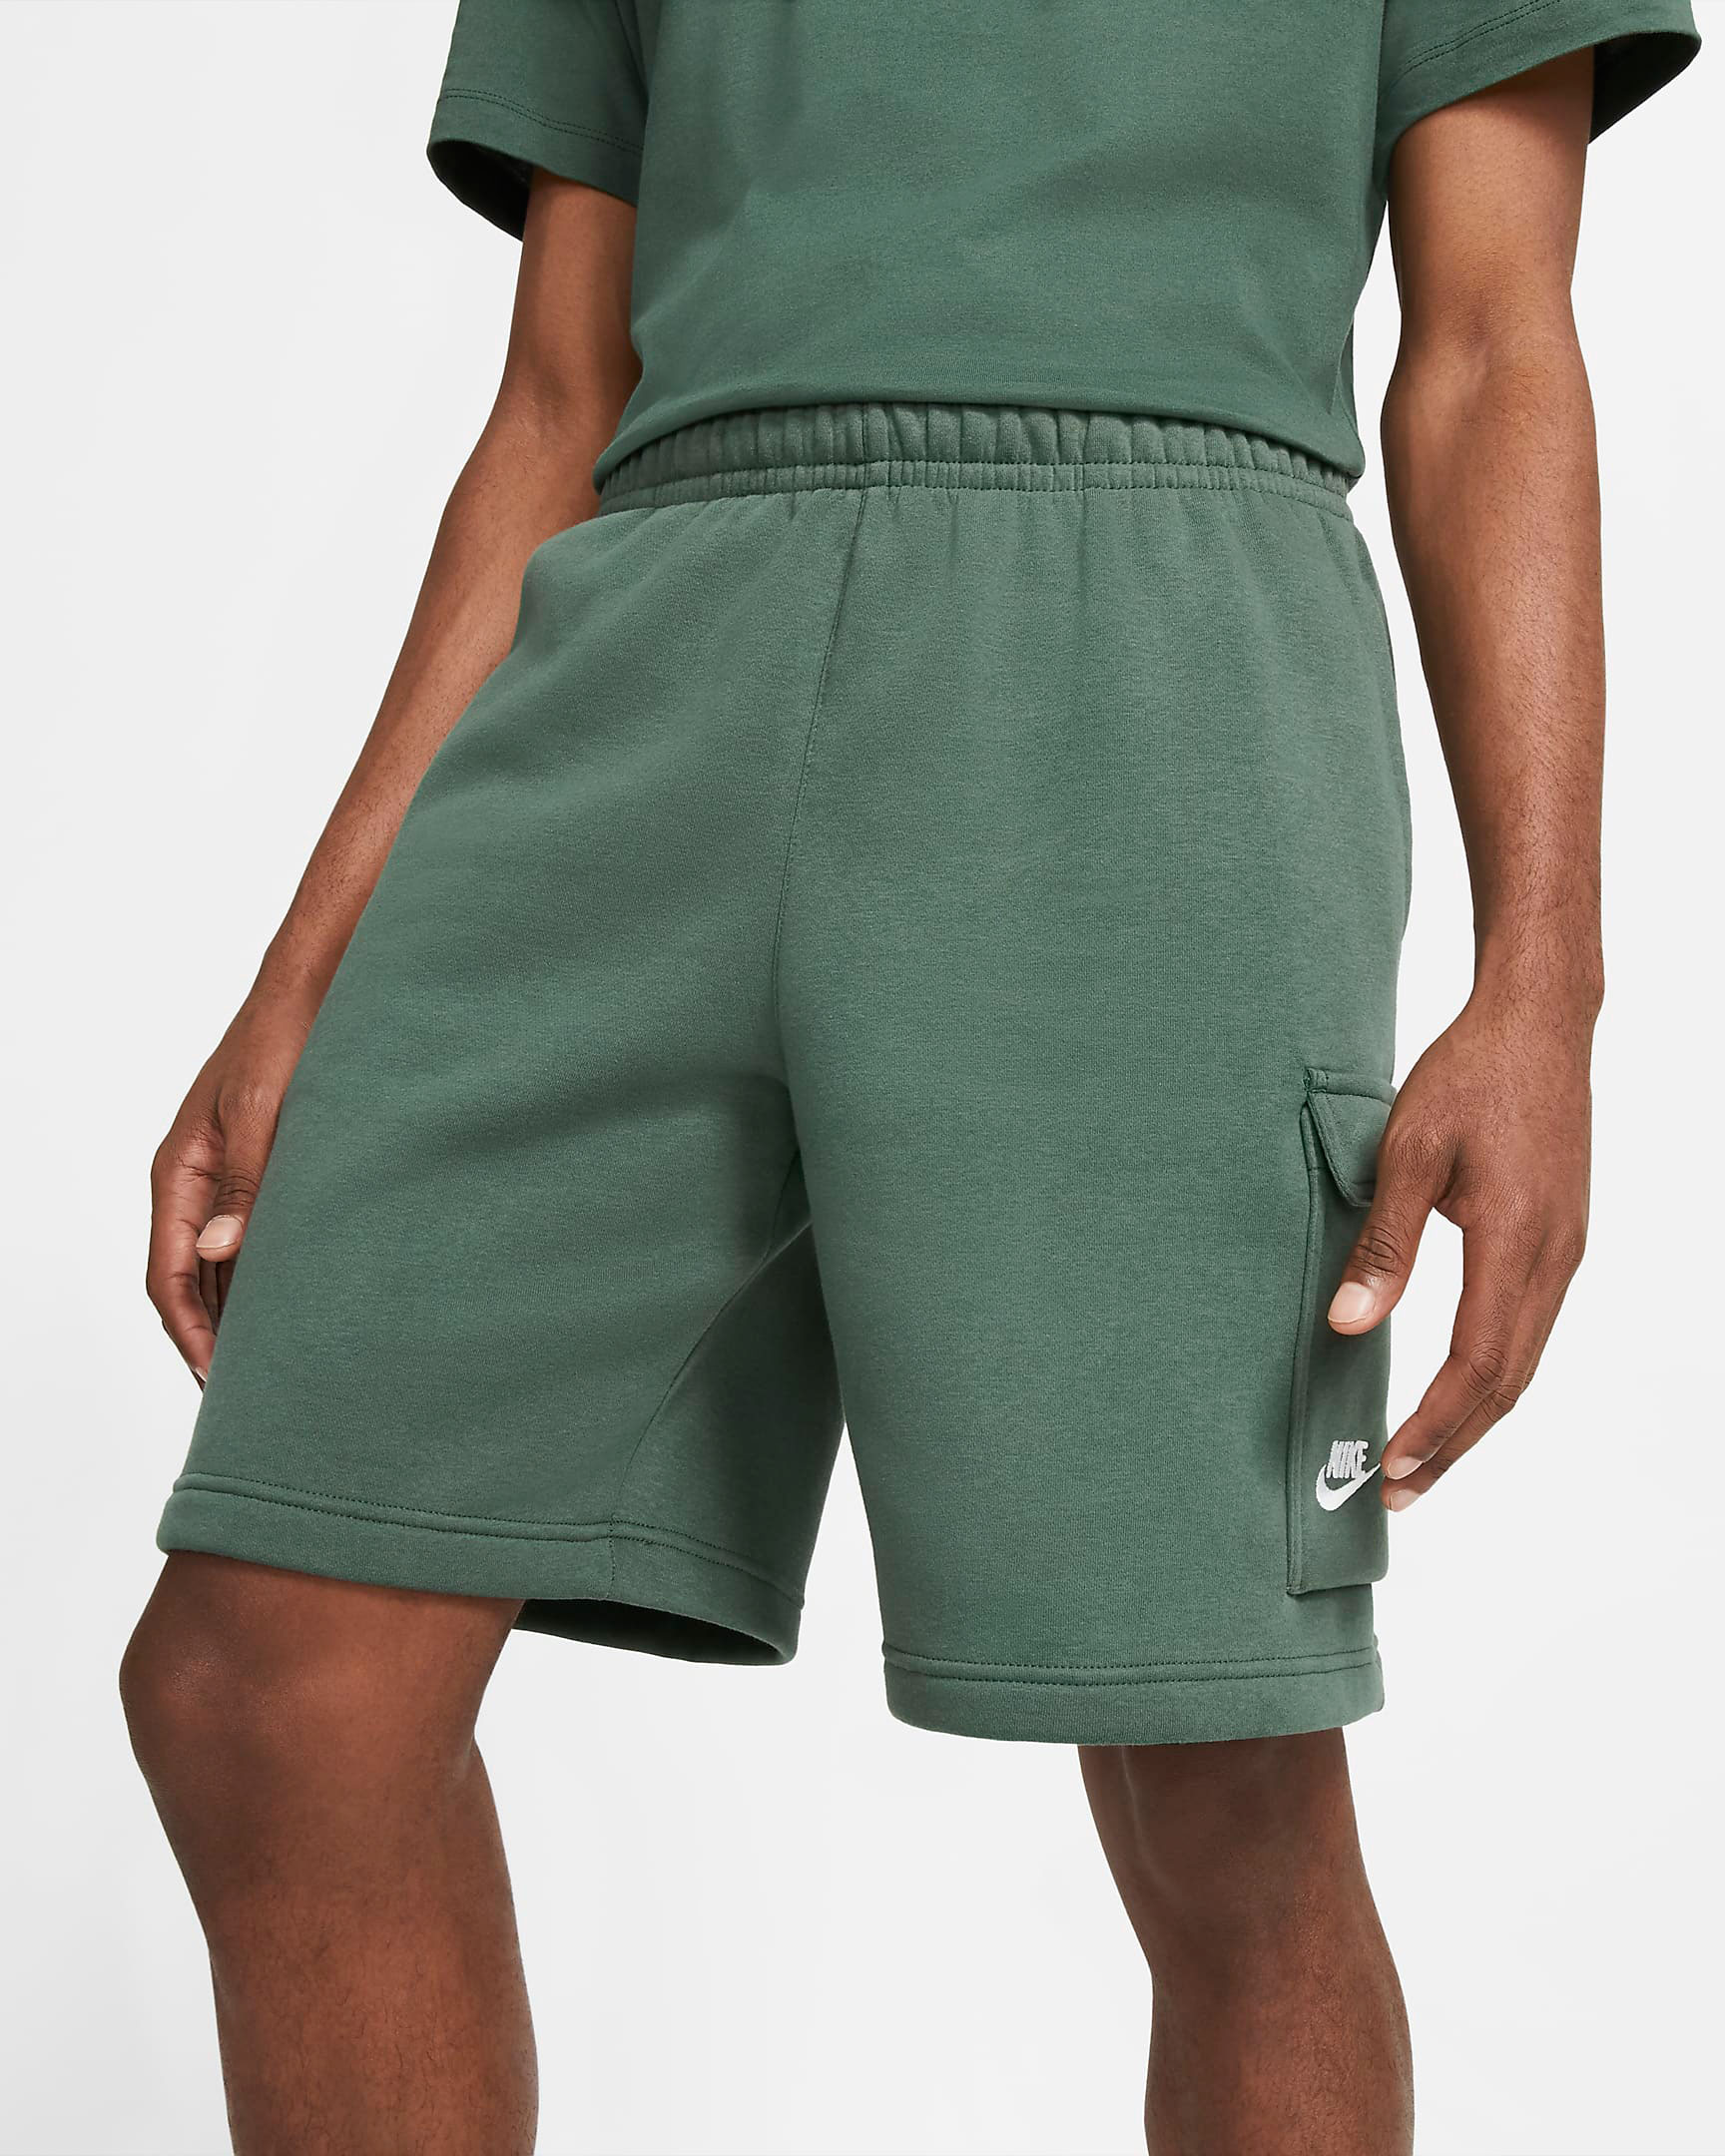 nike-galactic-jade-camo-shorts